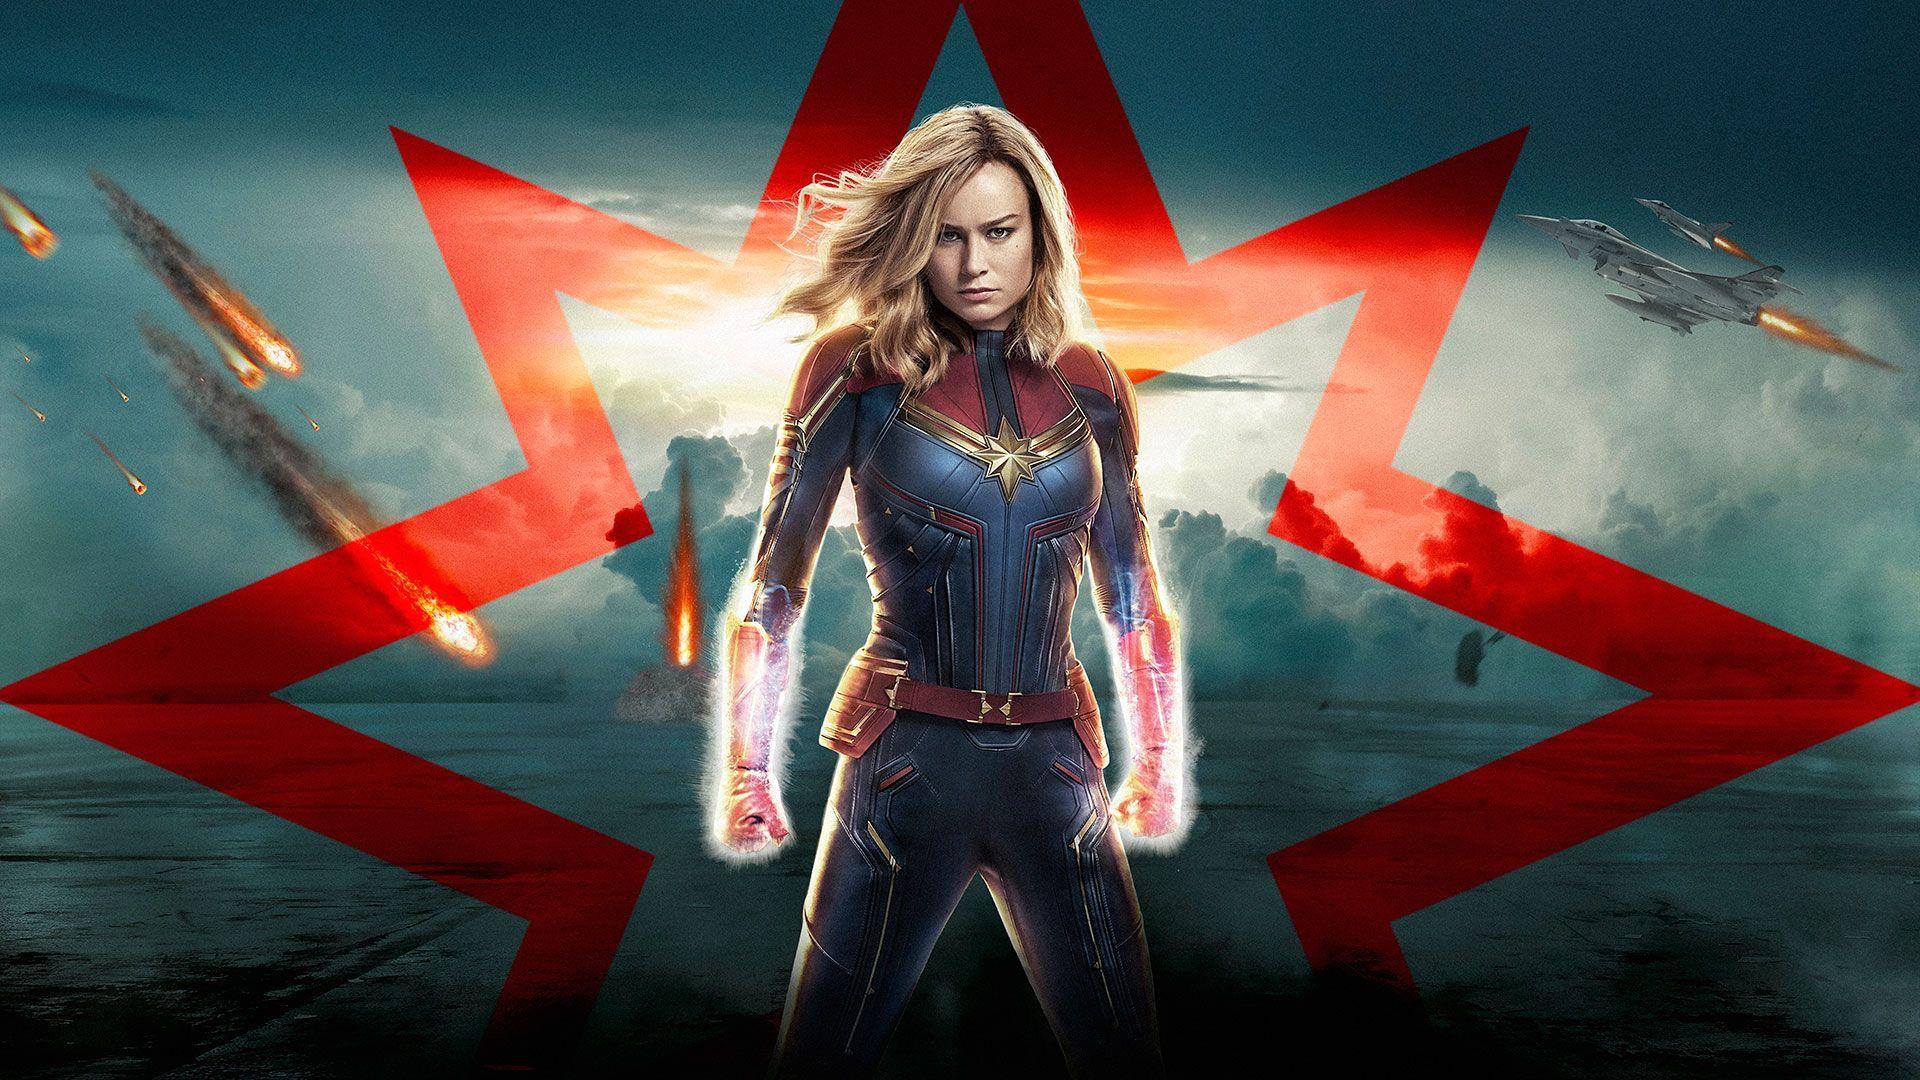 50 Captain Marvel Wallpaper Ideas In 2020 Captain Marvel Marvel Wallpaper Marvel